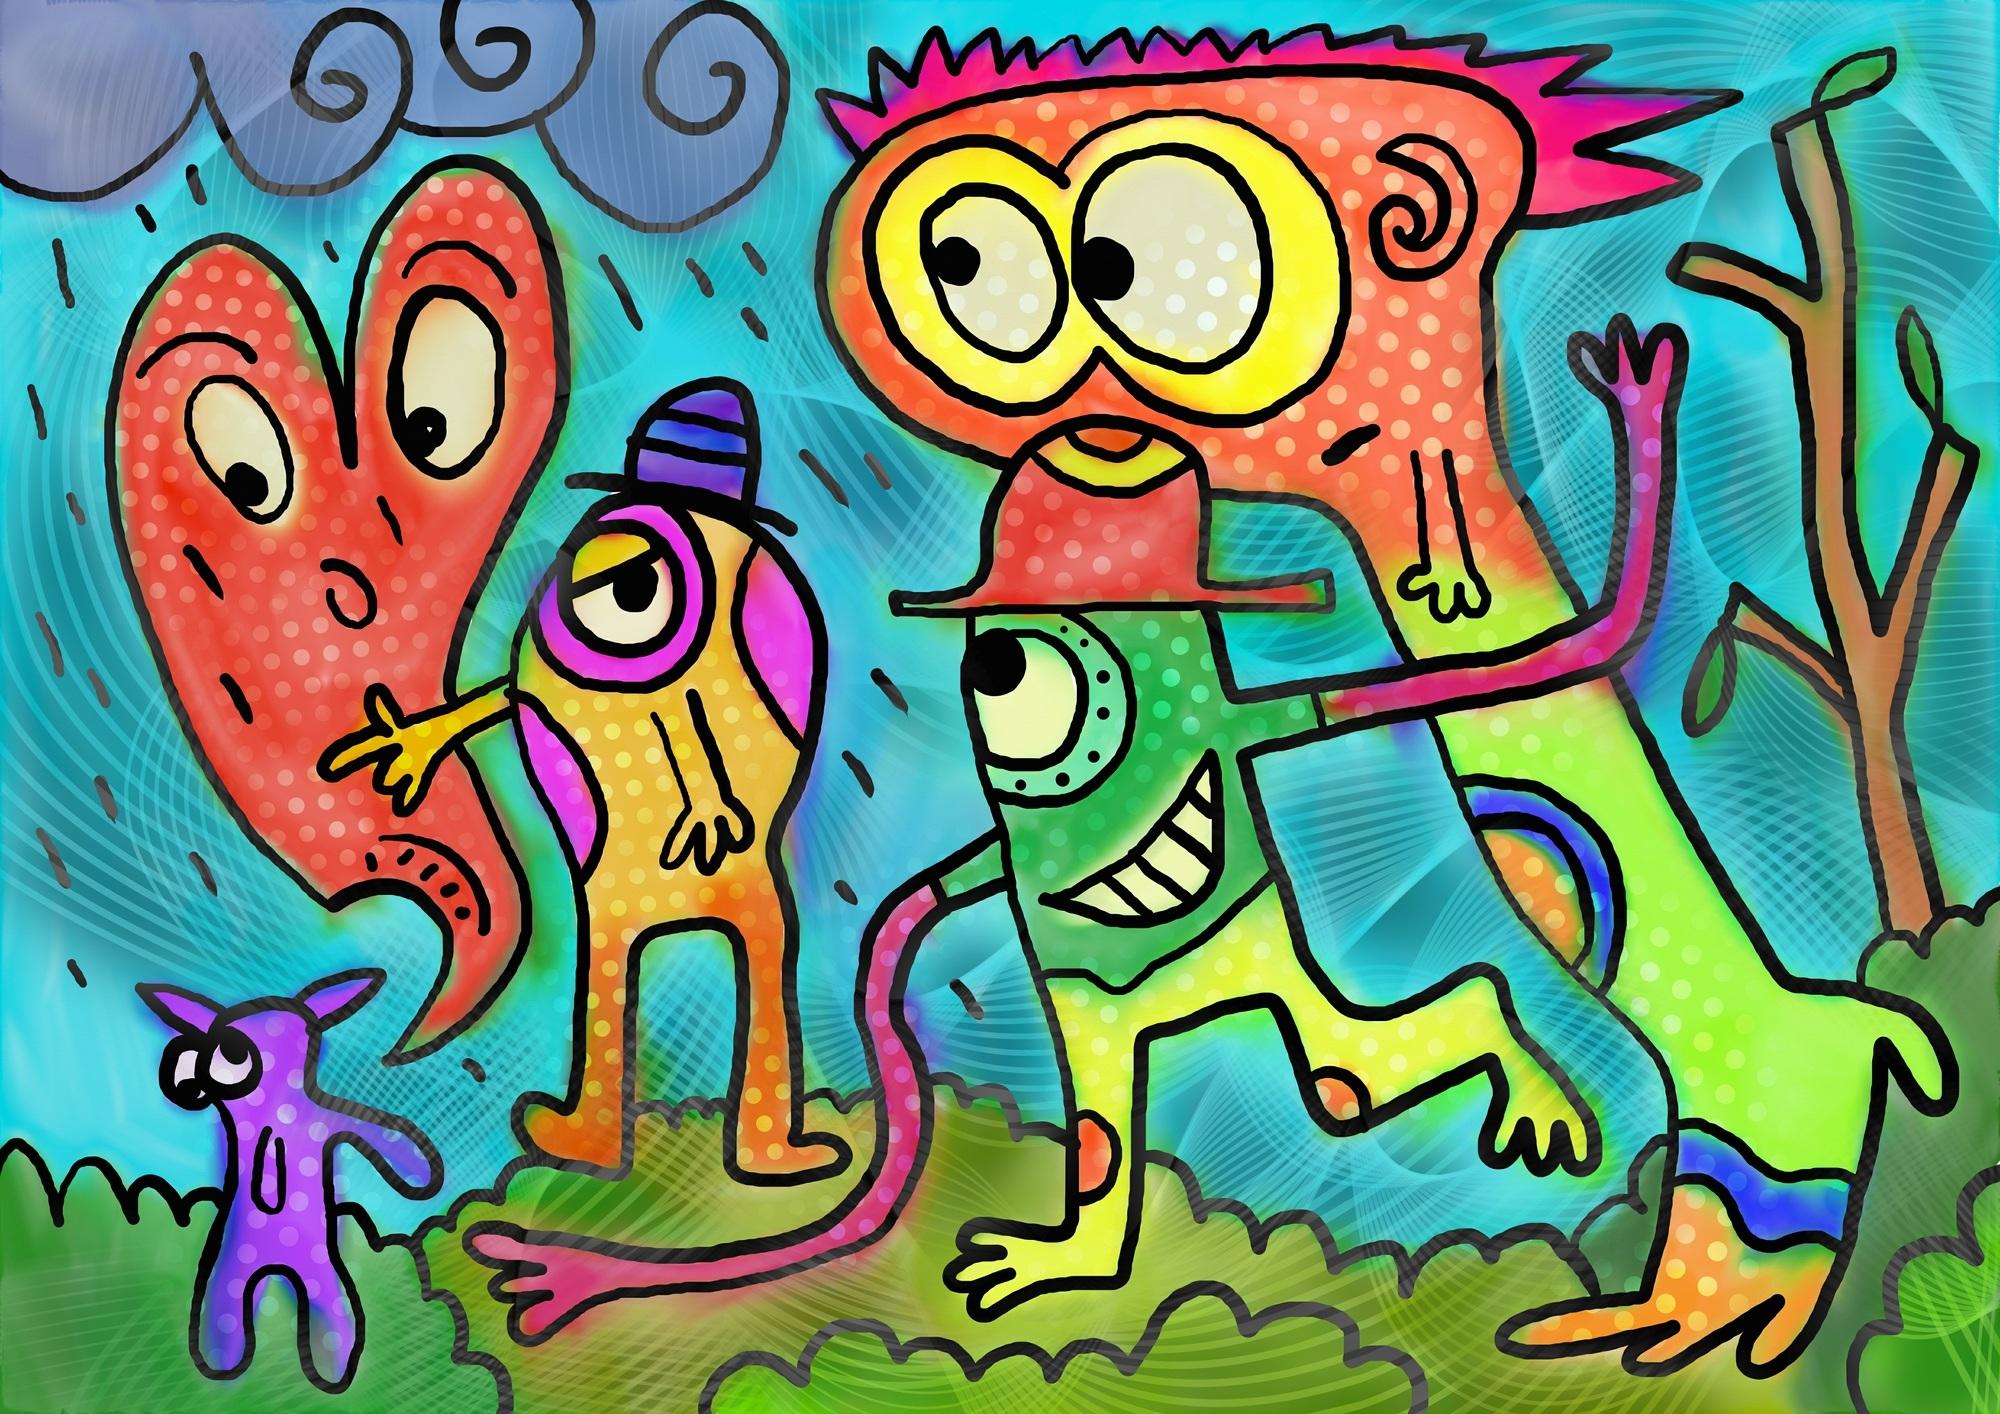 pintura, dibujo, monigotes, geeks, acuarela - Fondos de Pantalla HD - professor-falken.com